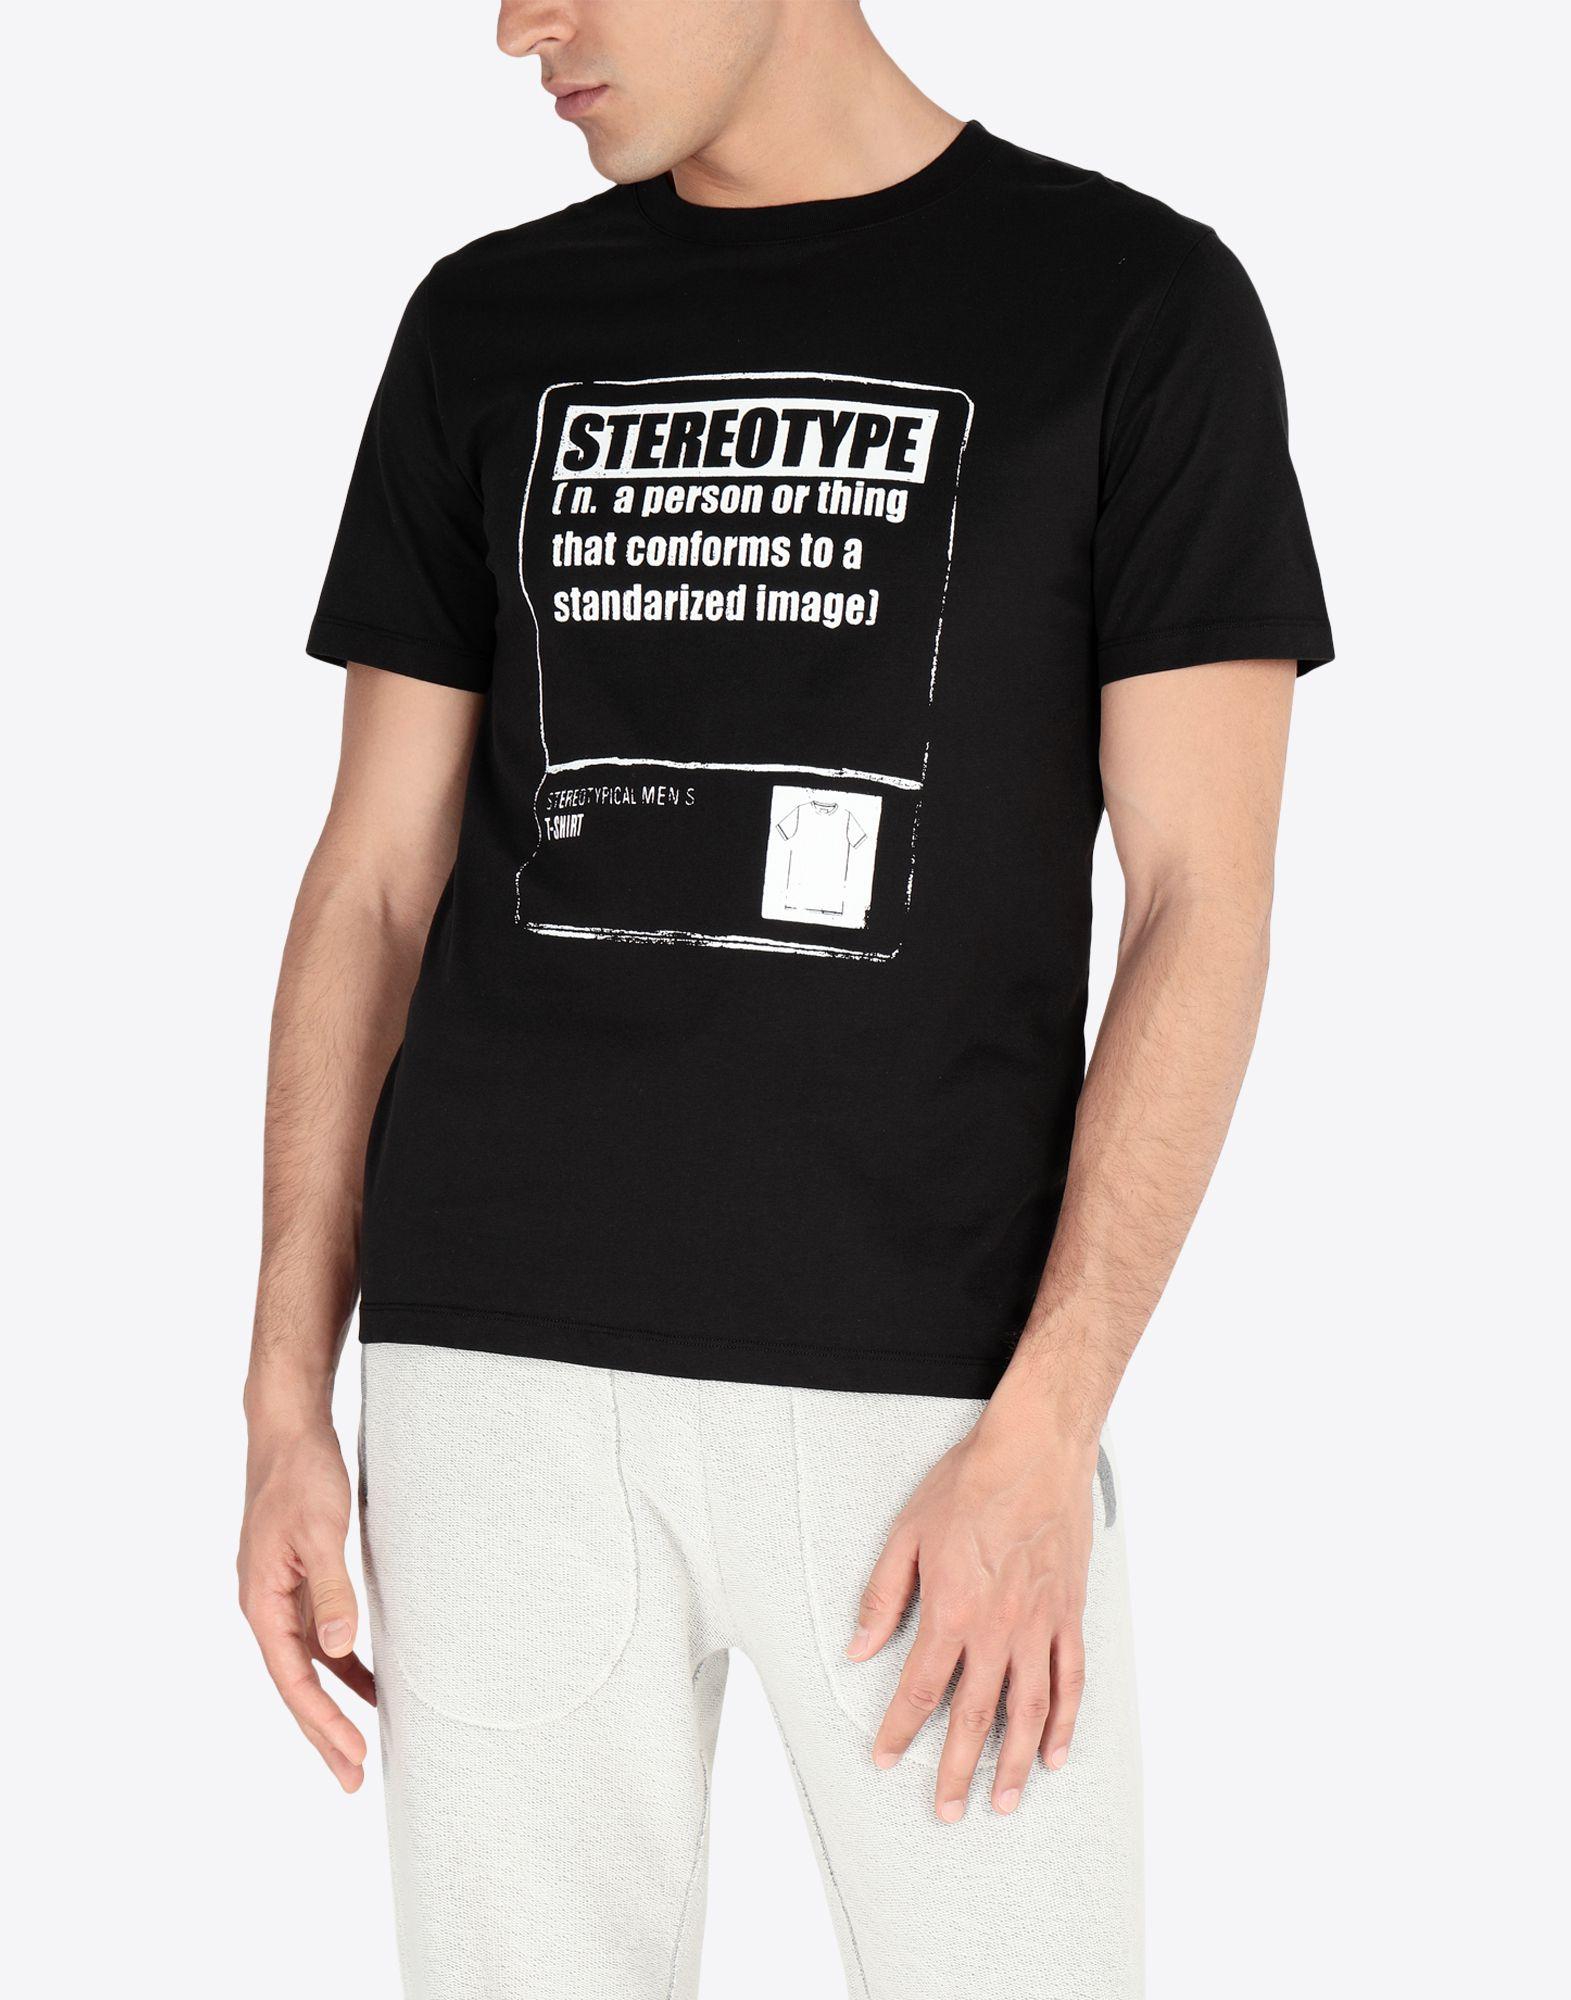 MAISON MARGIELA Stereotype' コットンTシャツ T シャツ メンズ r